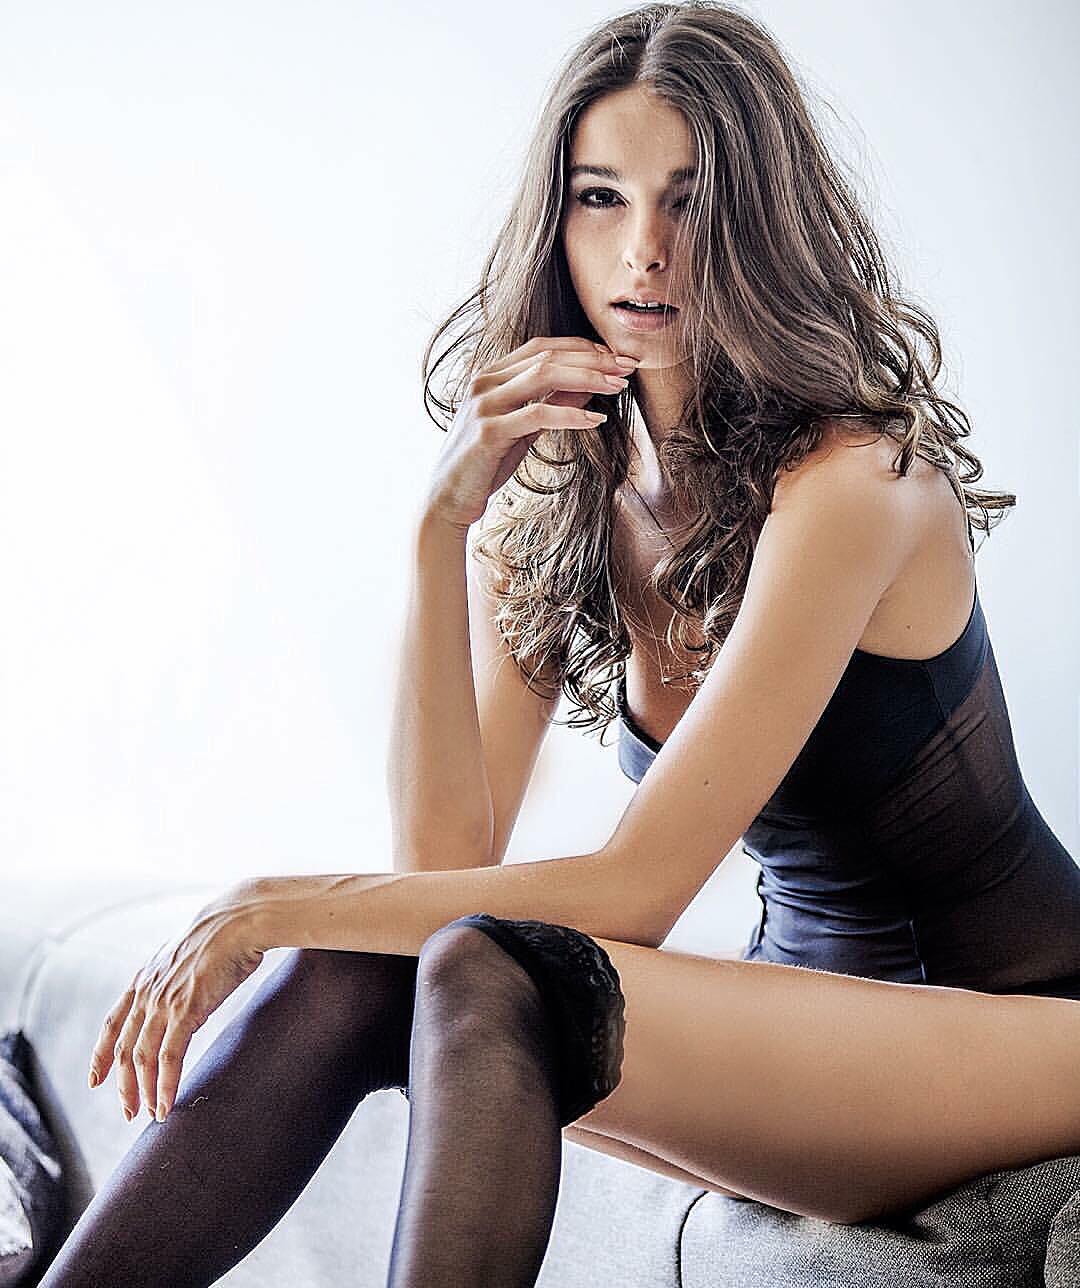 Diana Bouchardet